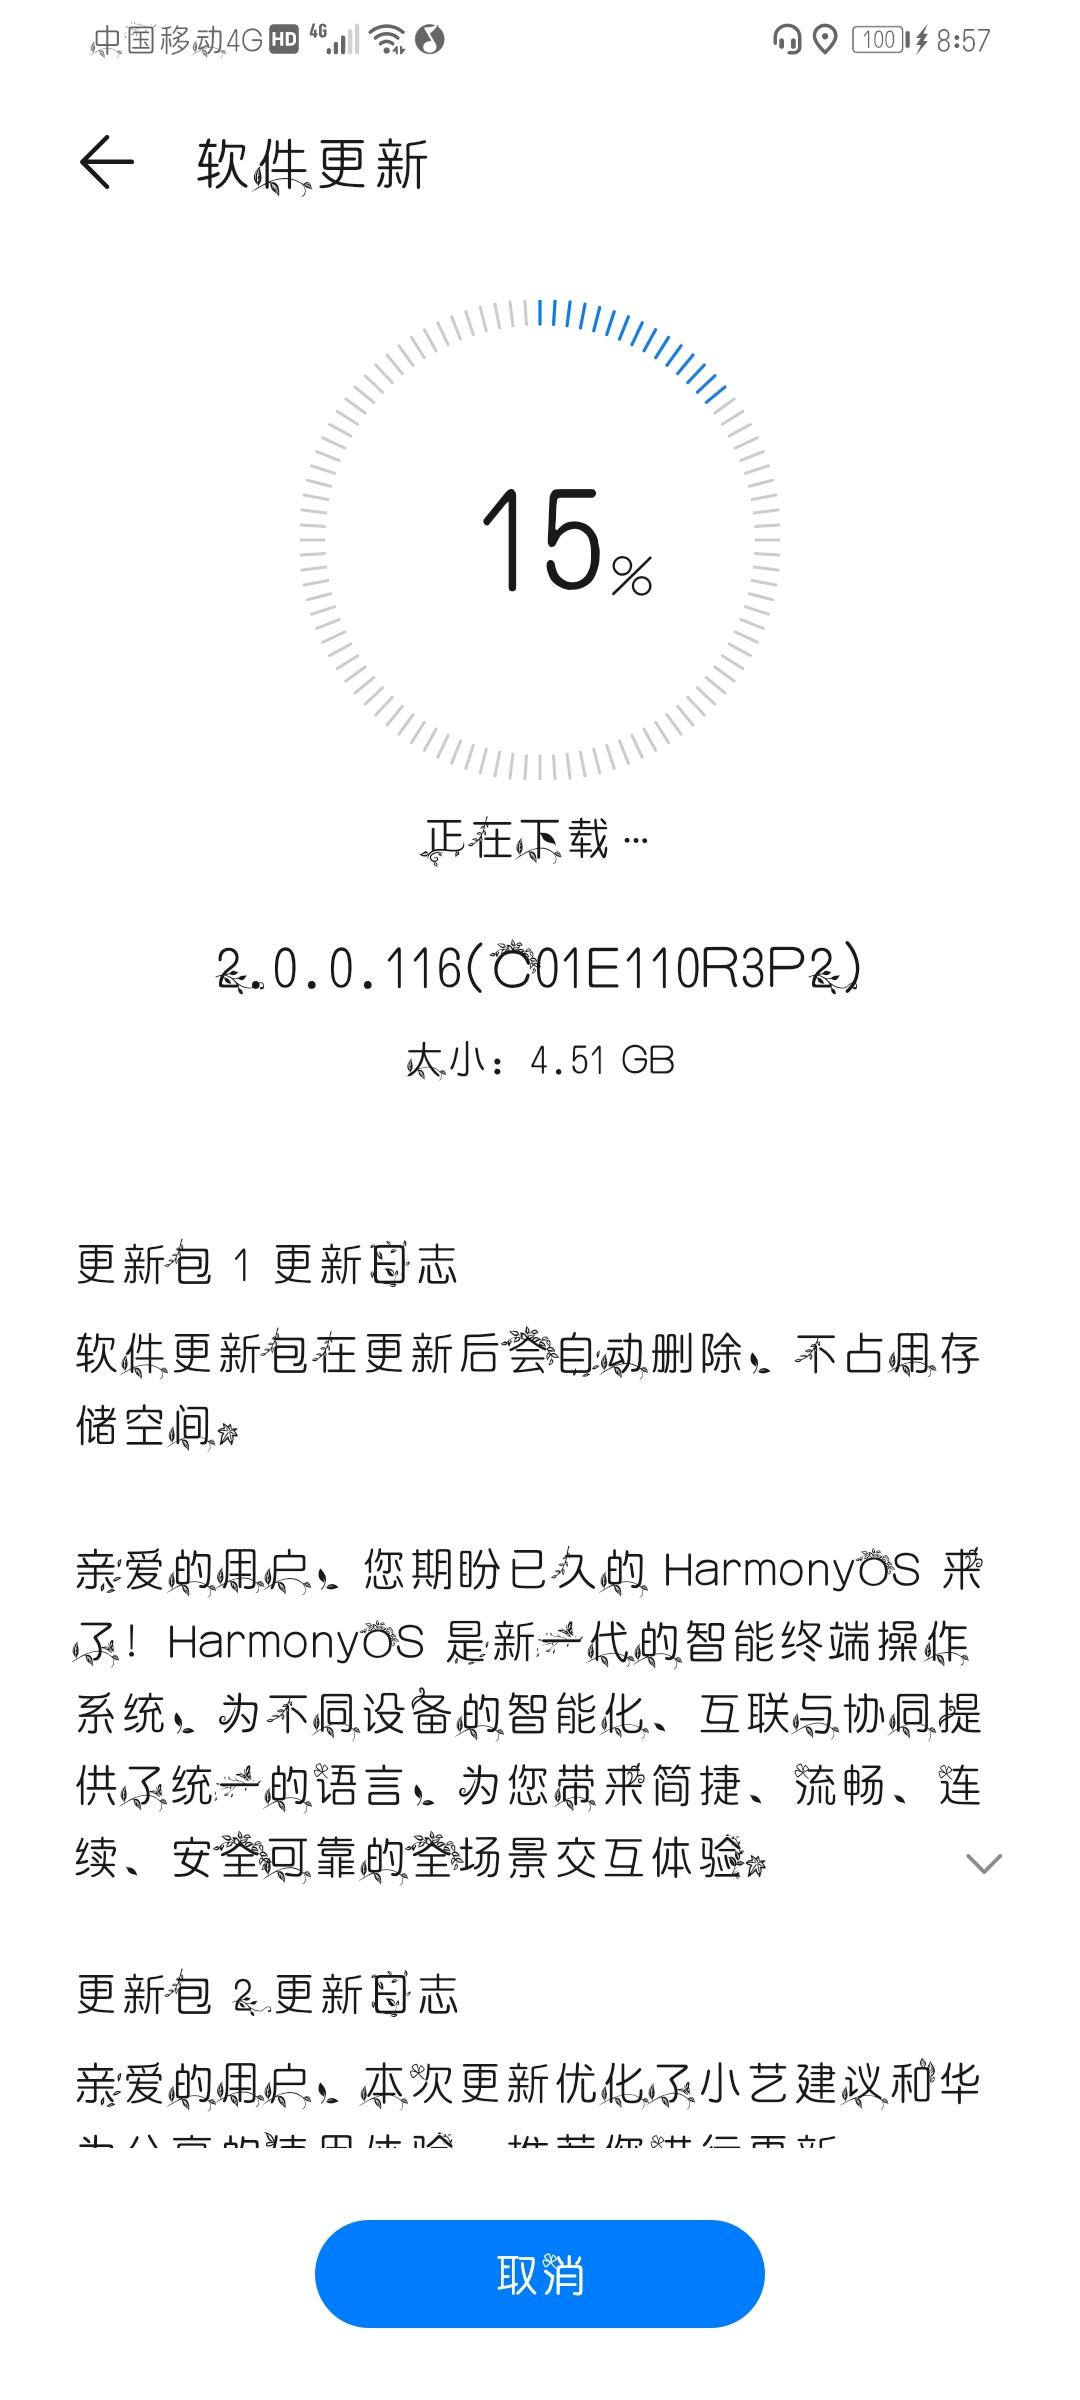 Screenshot_20210611_205711_com.huawei.android.hwouc.jpg